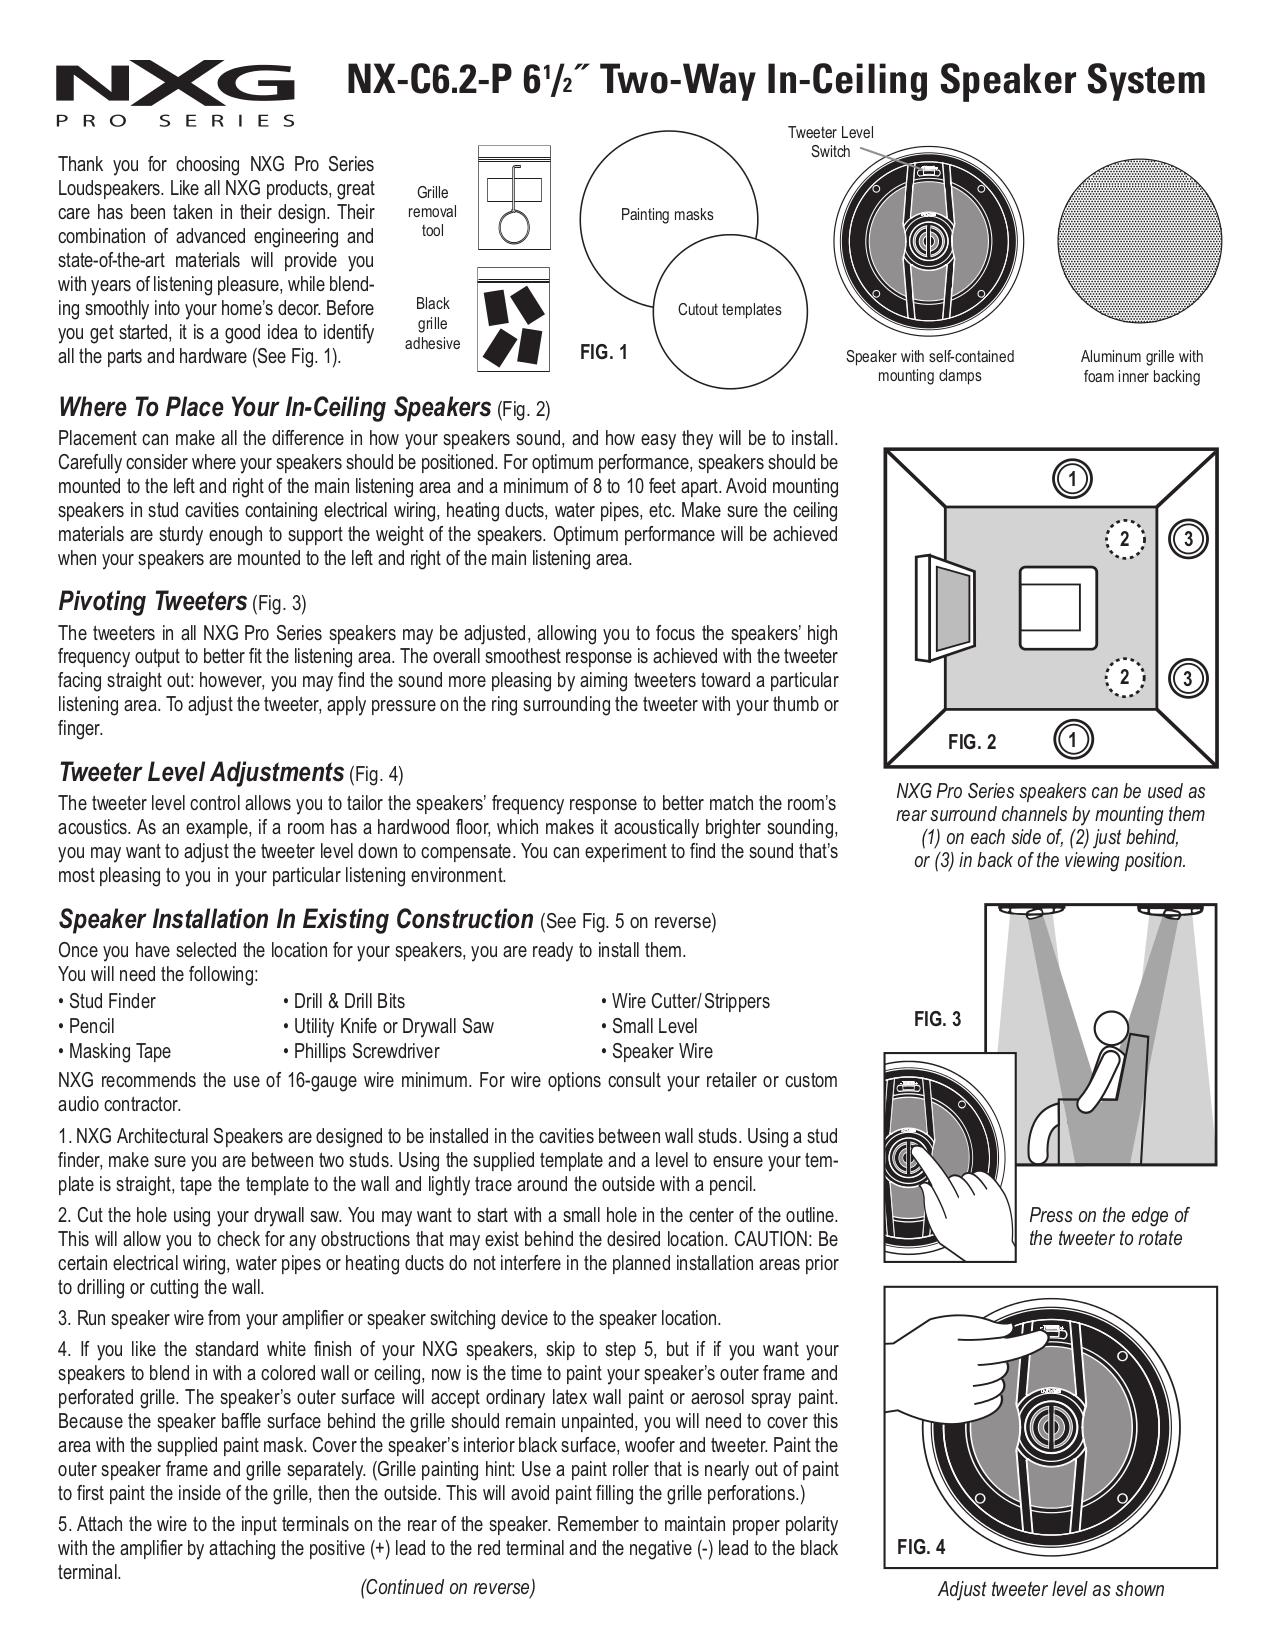 pdf for Nxg Speaker 620 manual